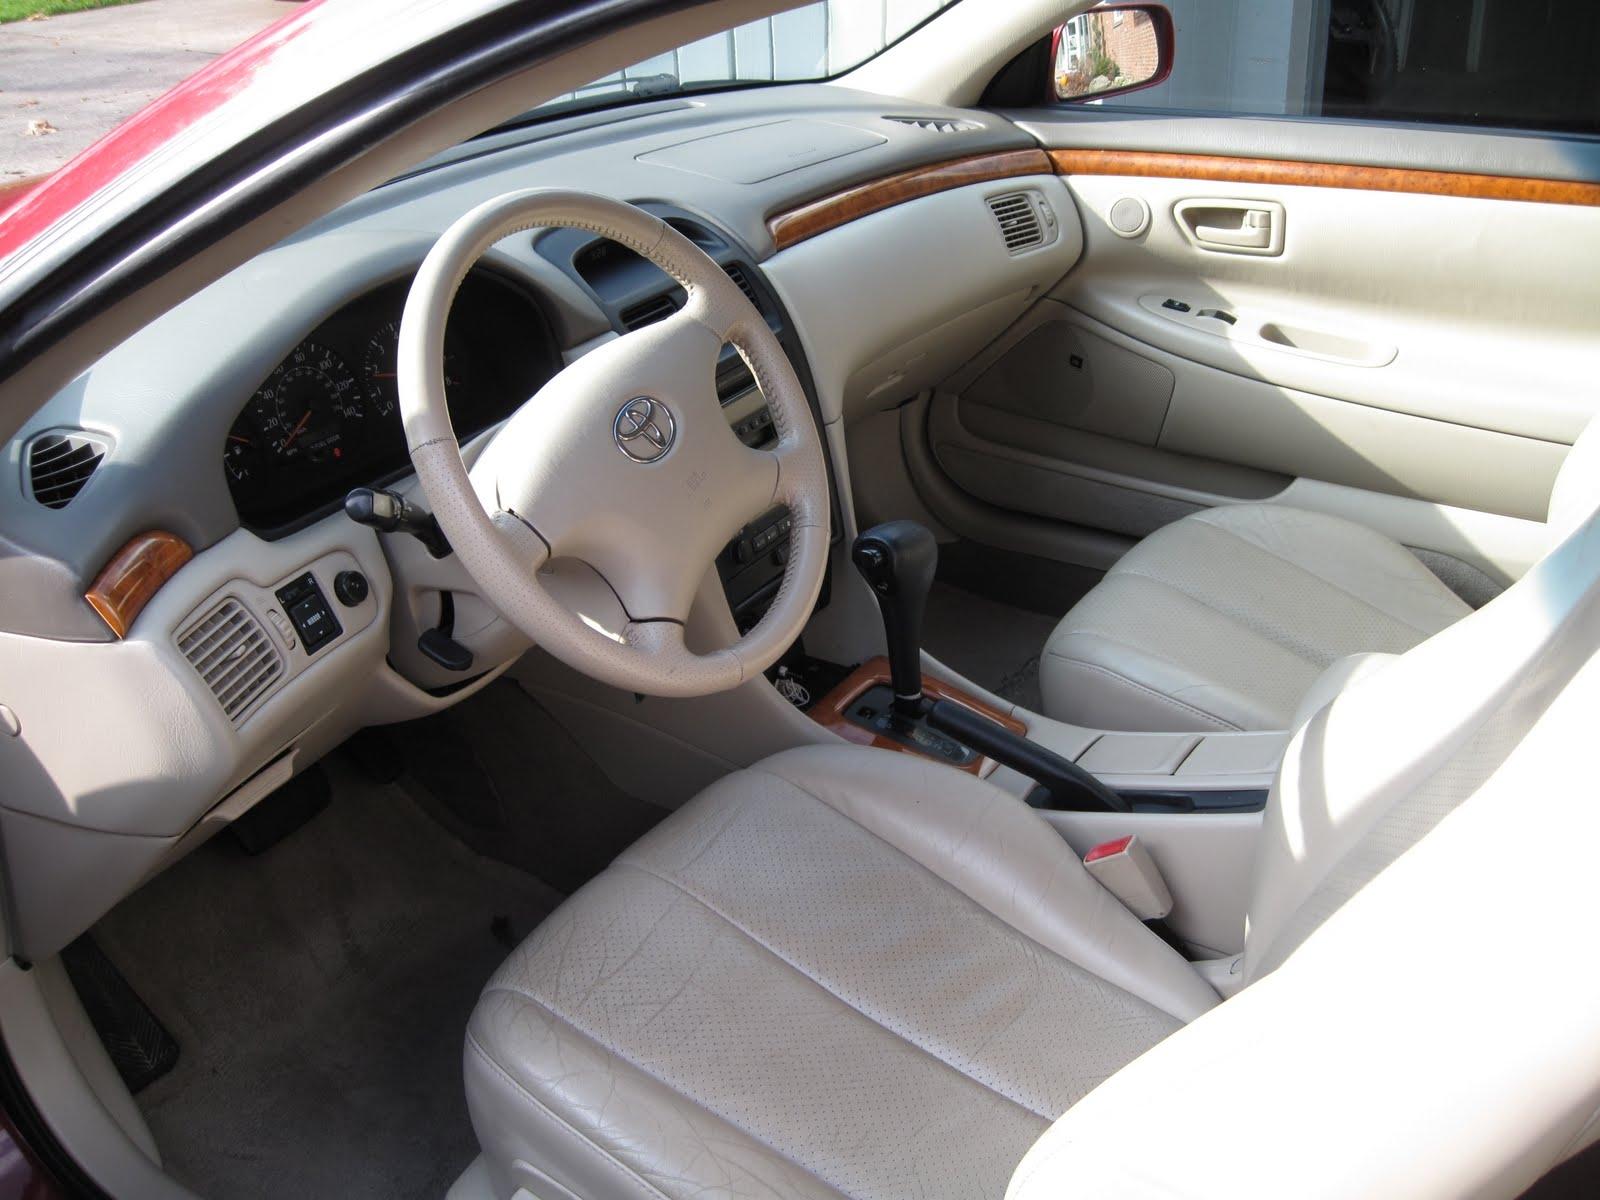 Toyota Camry Solara Review And Photos